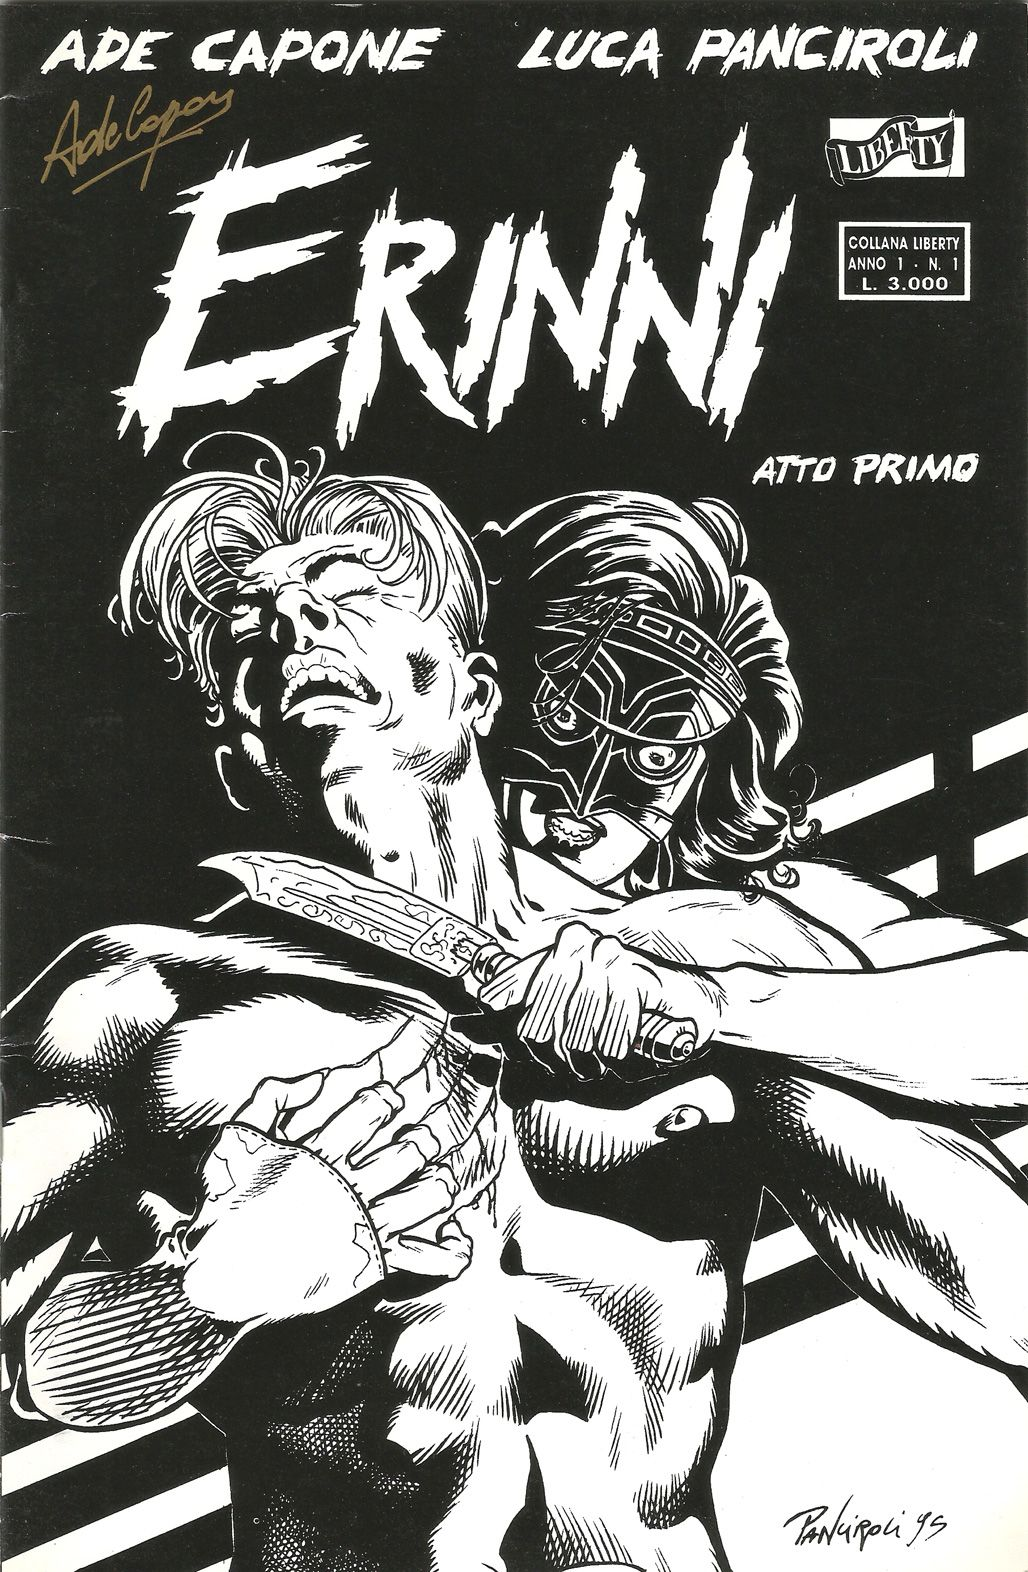 900 Pa Alphabetical Artists Ideas In 2021 Comic Art Comics Art